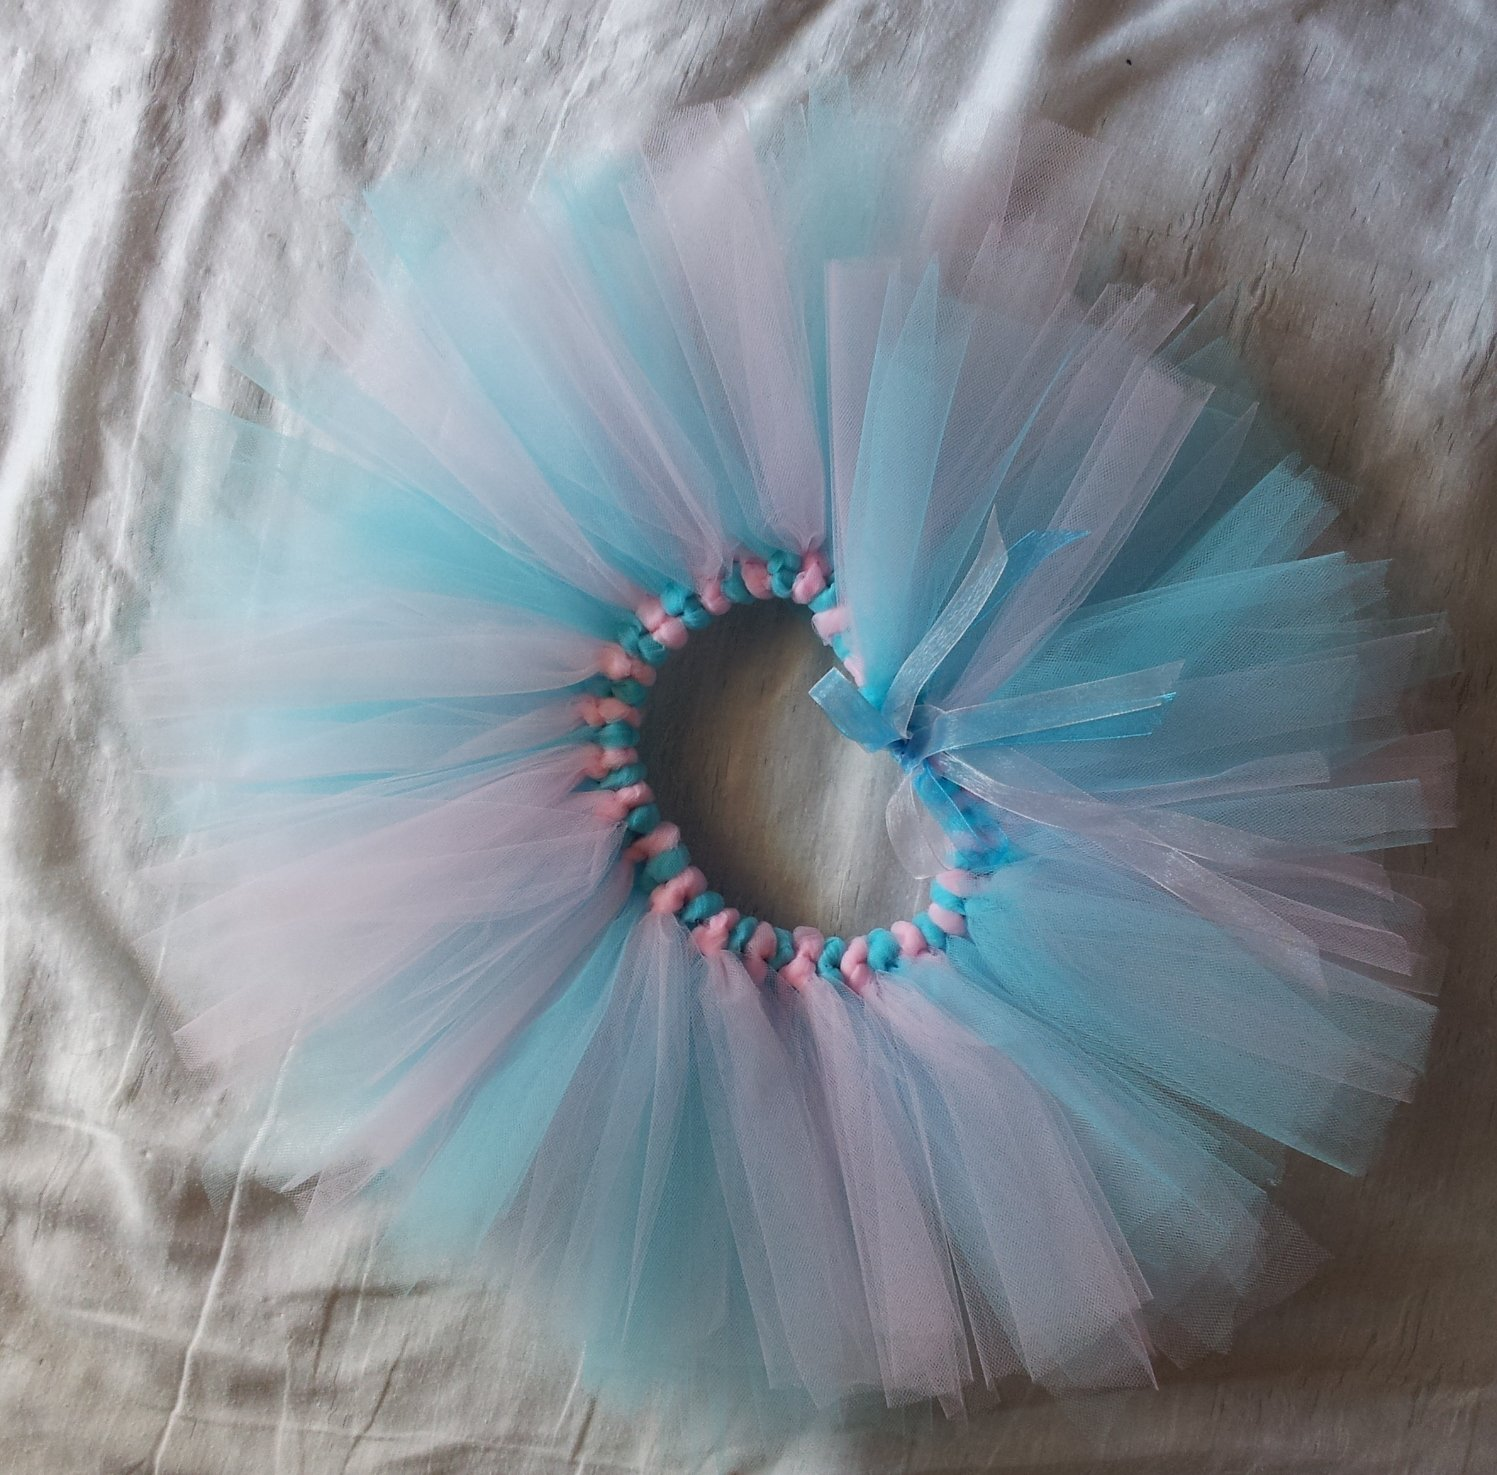 Toodleloos Tutu: Soft Pink and Tiffany Blue